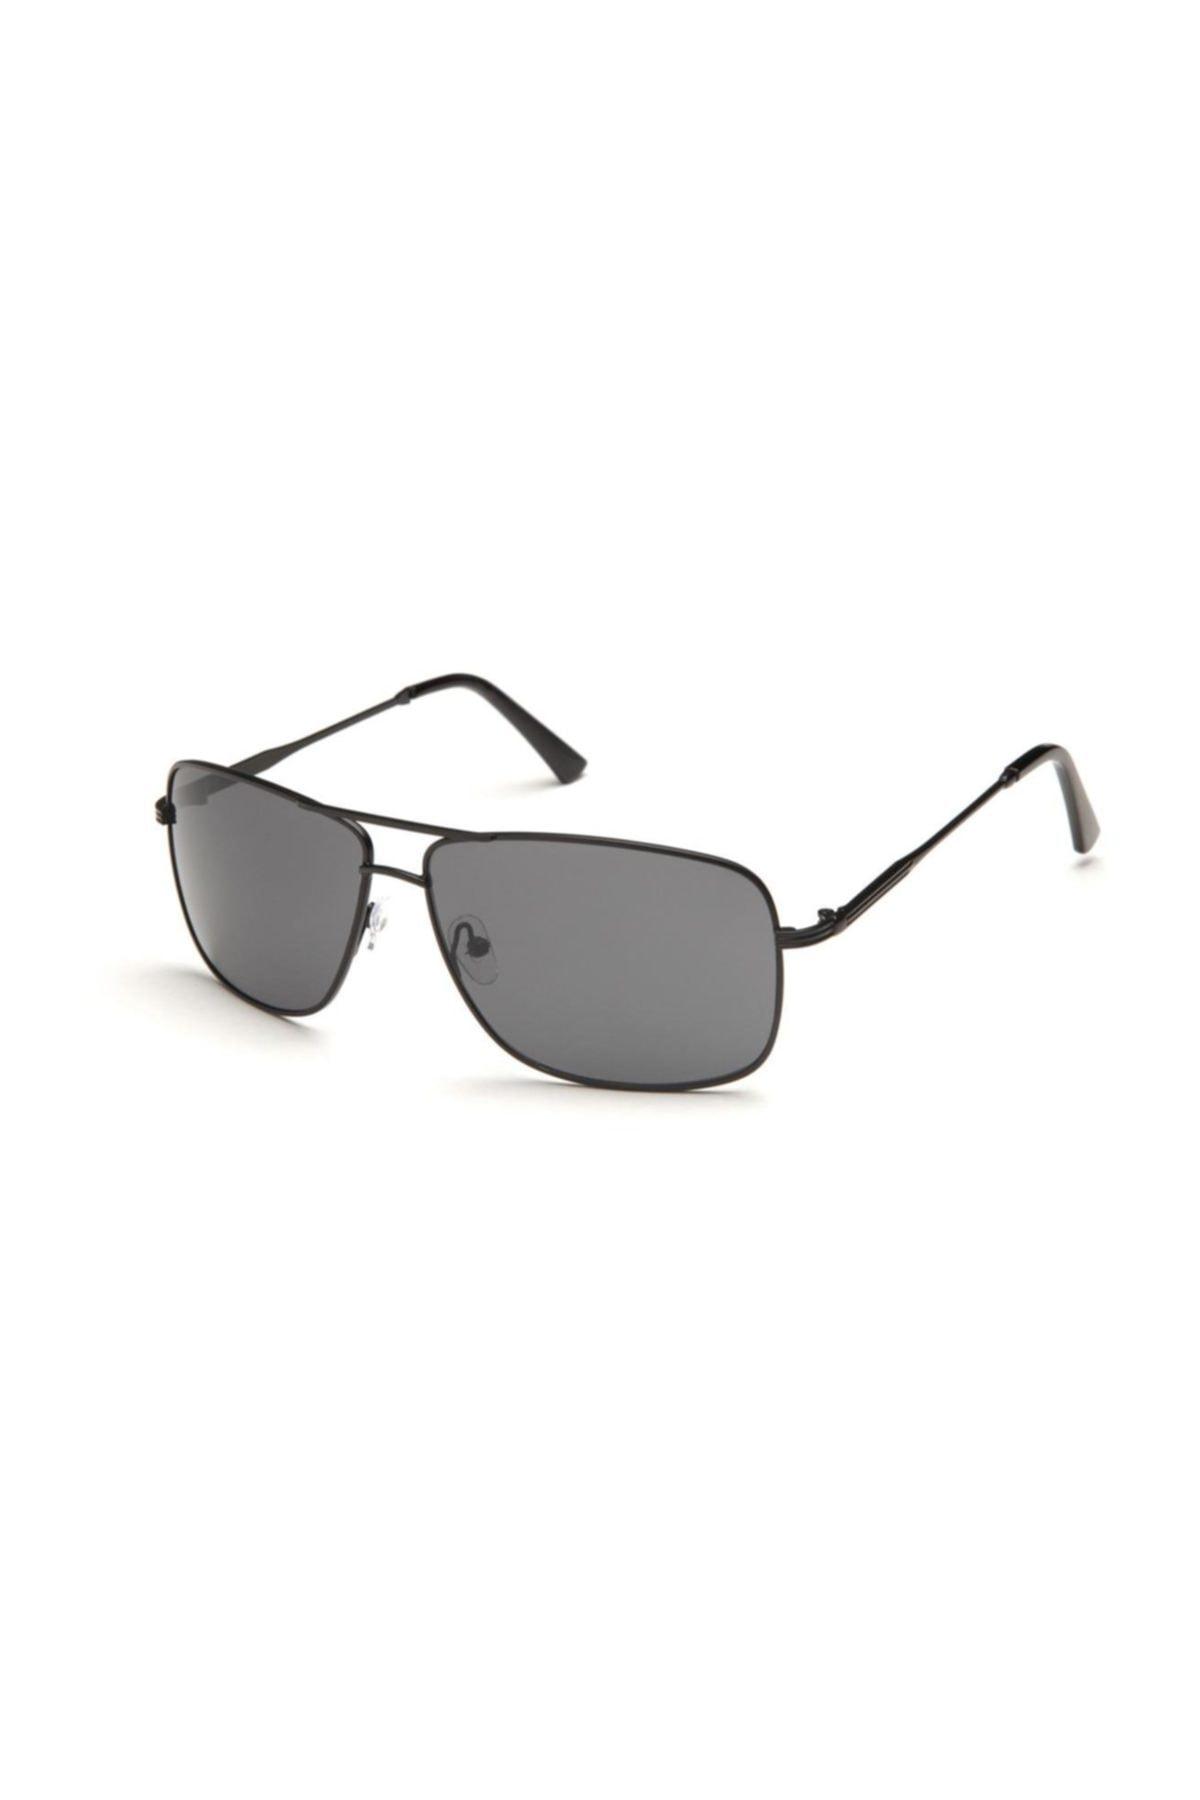 Di Caprio Erkek Dikdörtgen Güneş Gözlüğü DH1564A 1